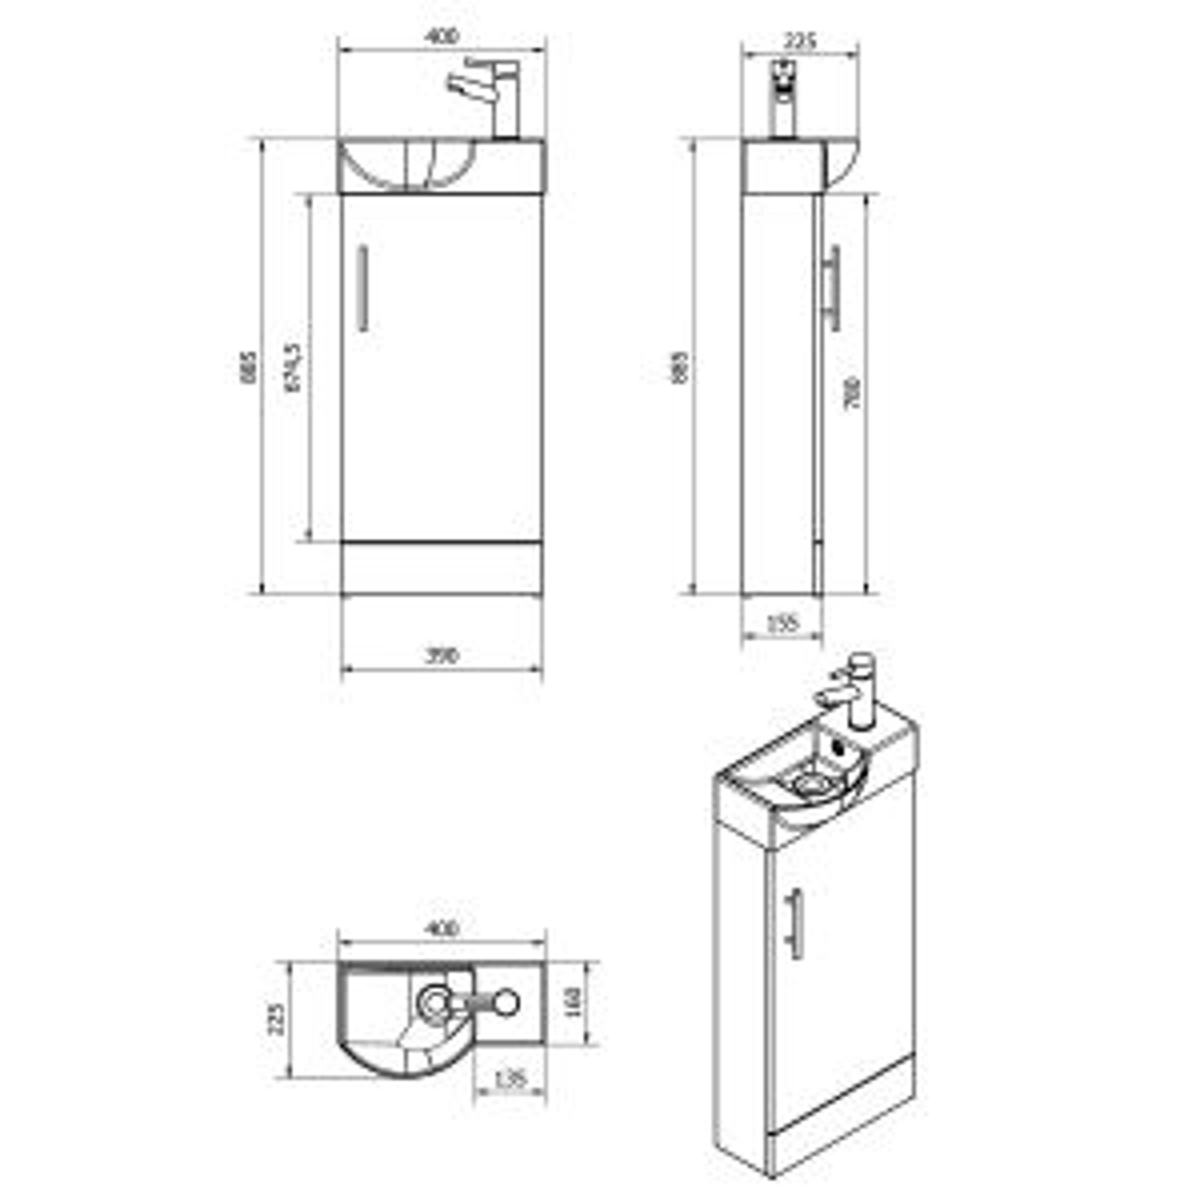 RAK Series 600 Back To Wall Toilet and 400 Series Medium Oak Mini Vanity Unit Drawing